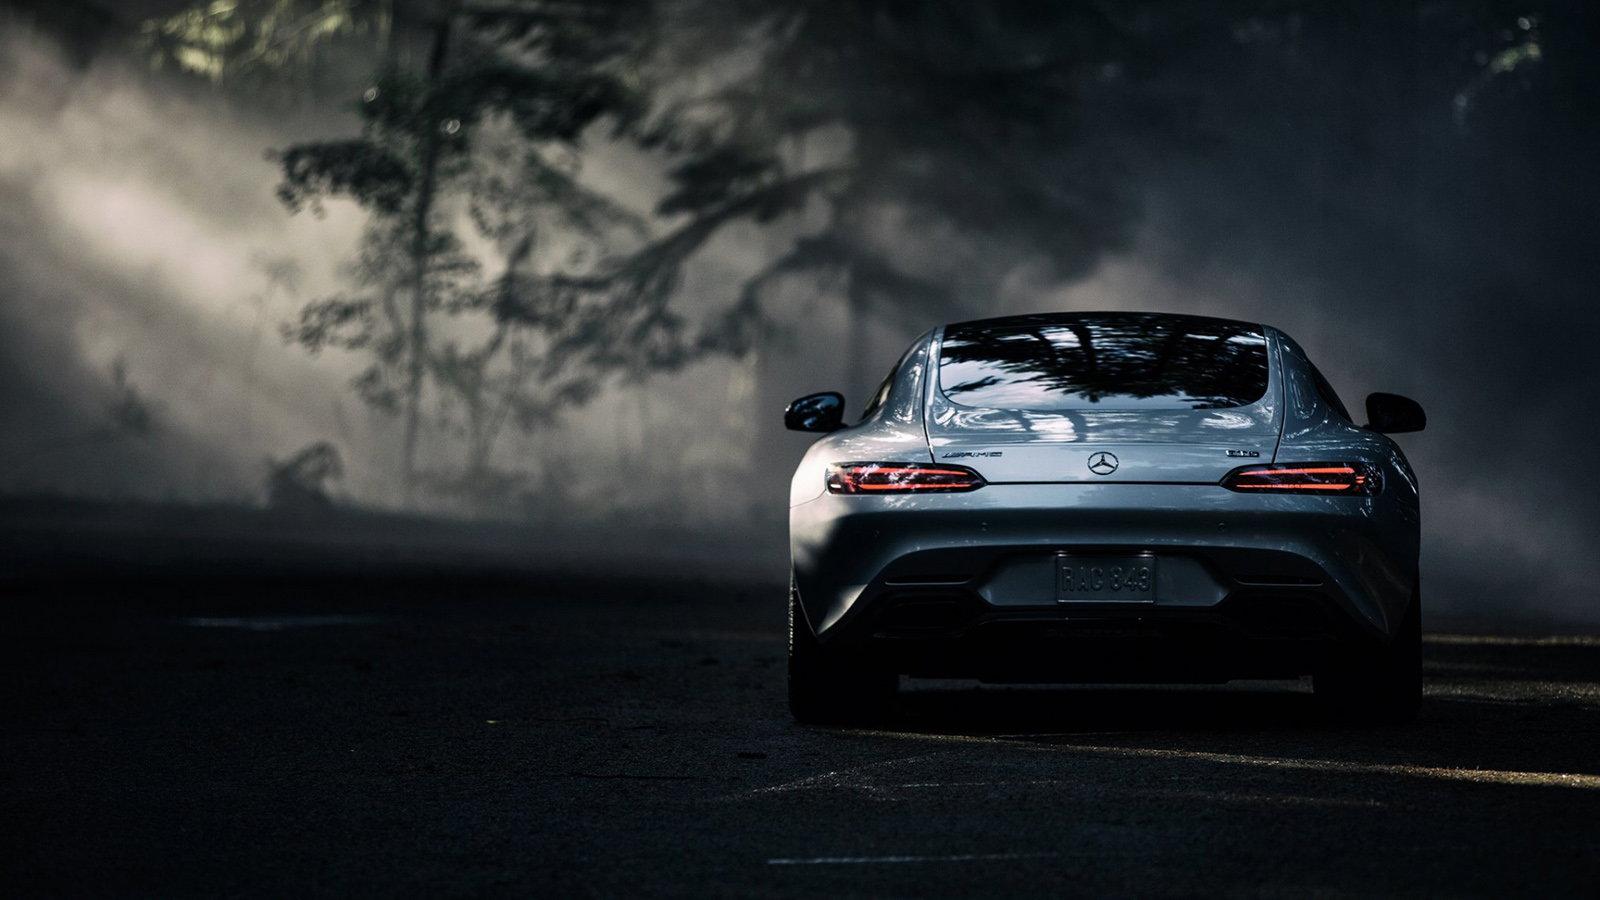 7 Ominous Mercedes-Benz Wallpapers | Mbworld